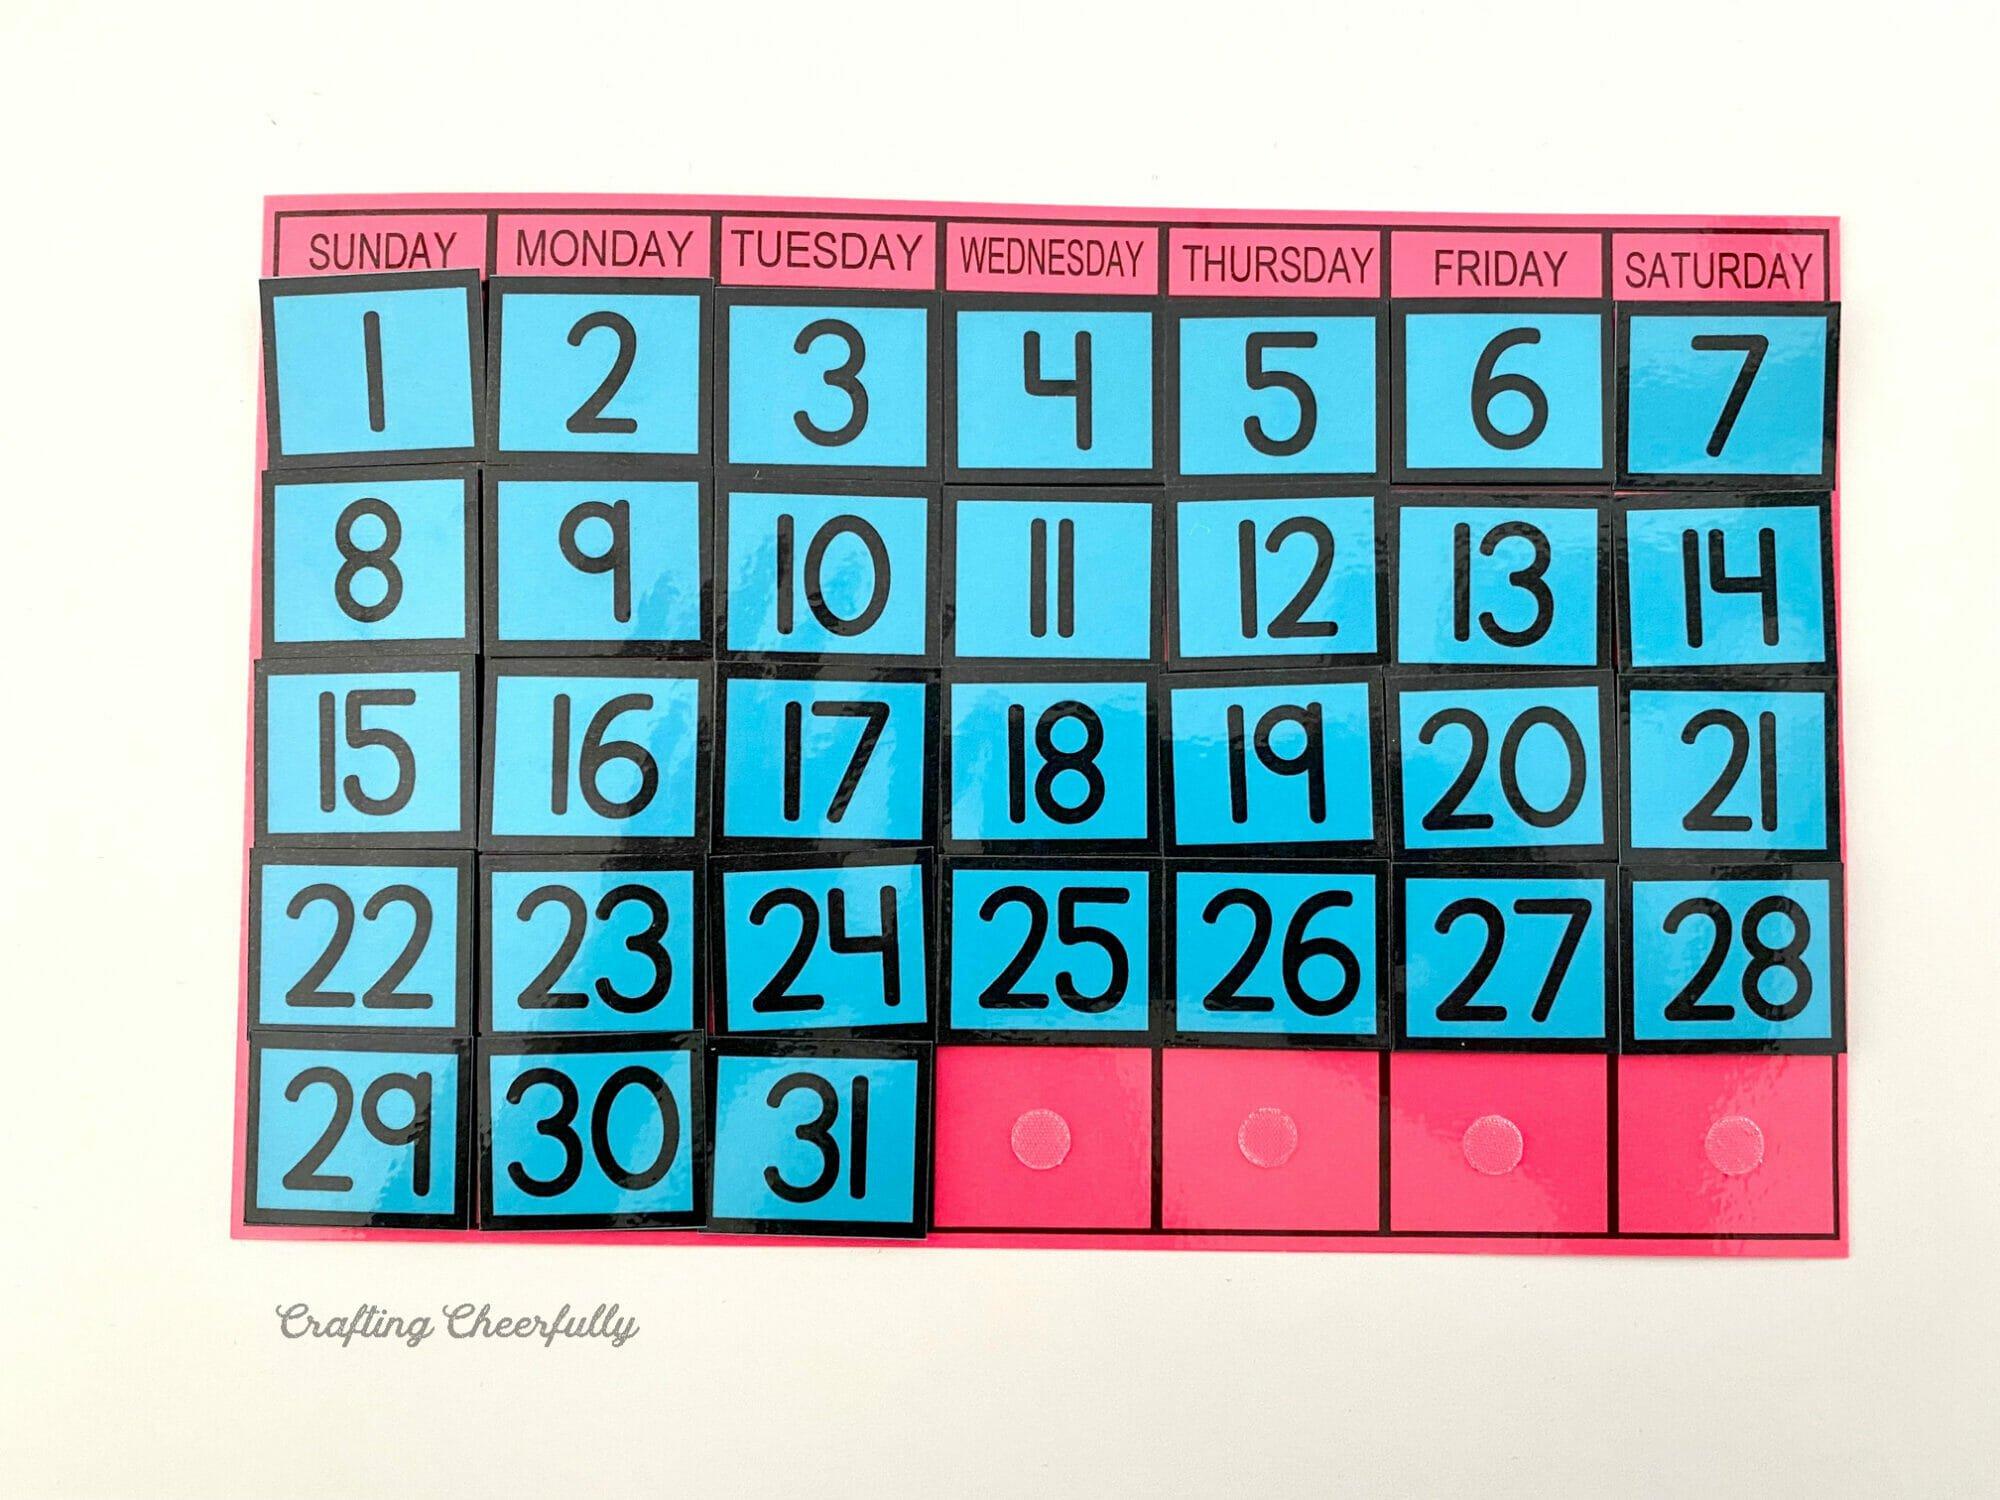 Pink calendar printable with blue calendar dates on it.